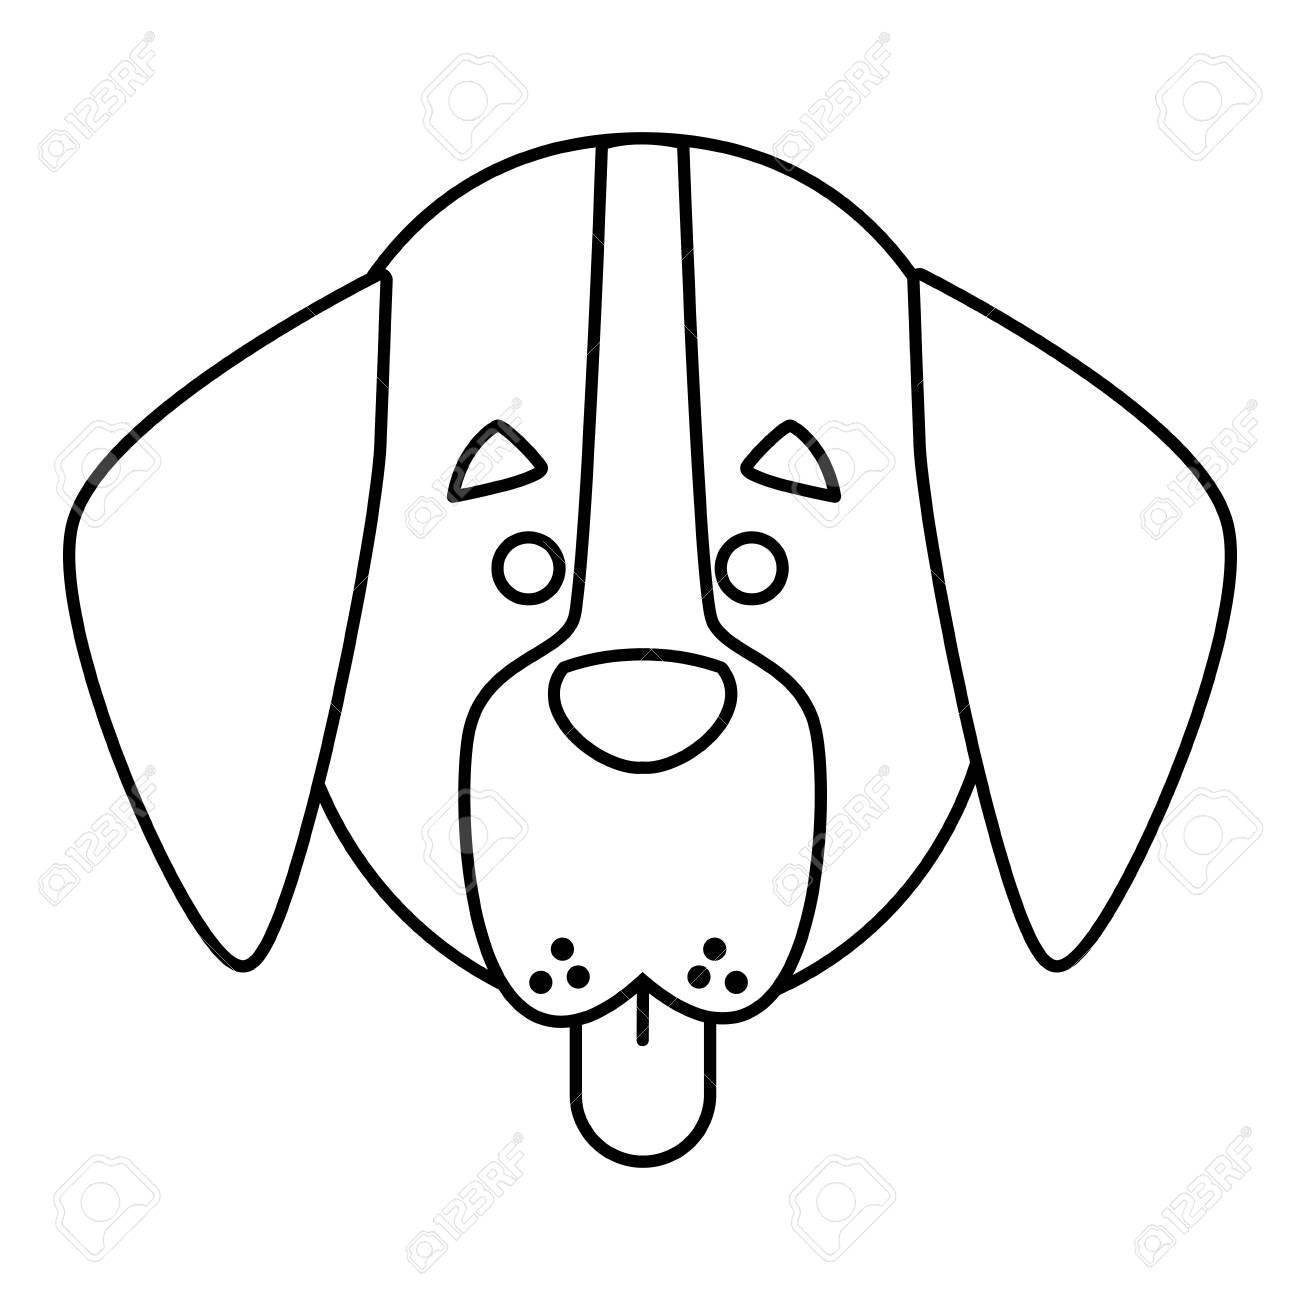 Dog Head Cartoon Icon Vector Illustration Graphic Design Royalty